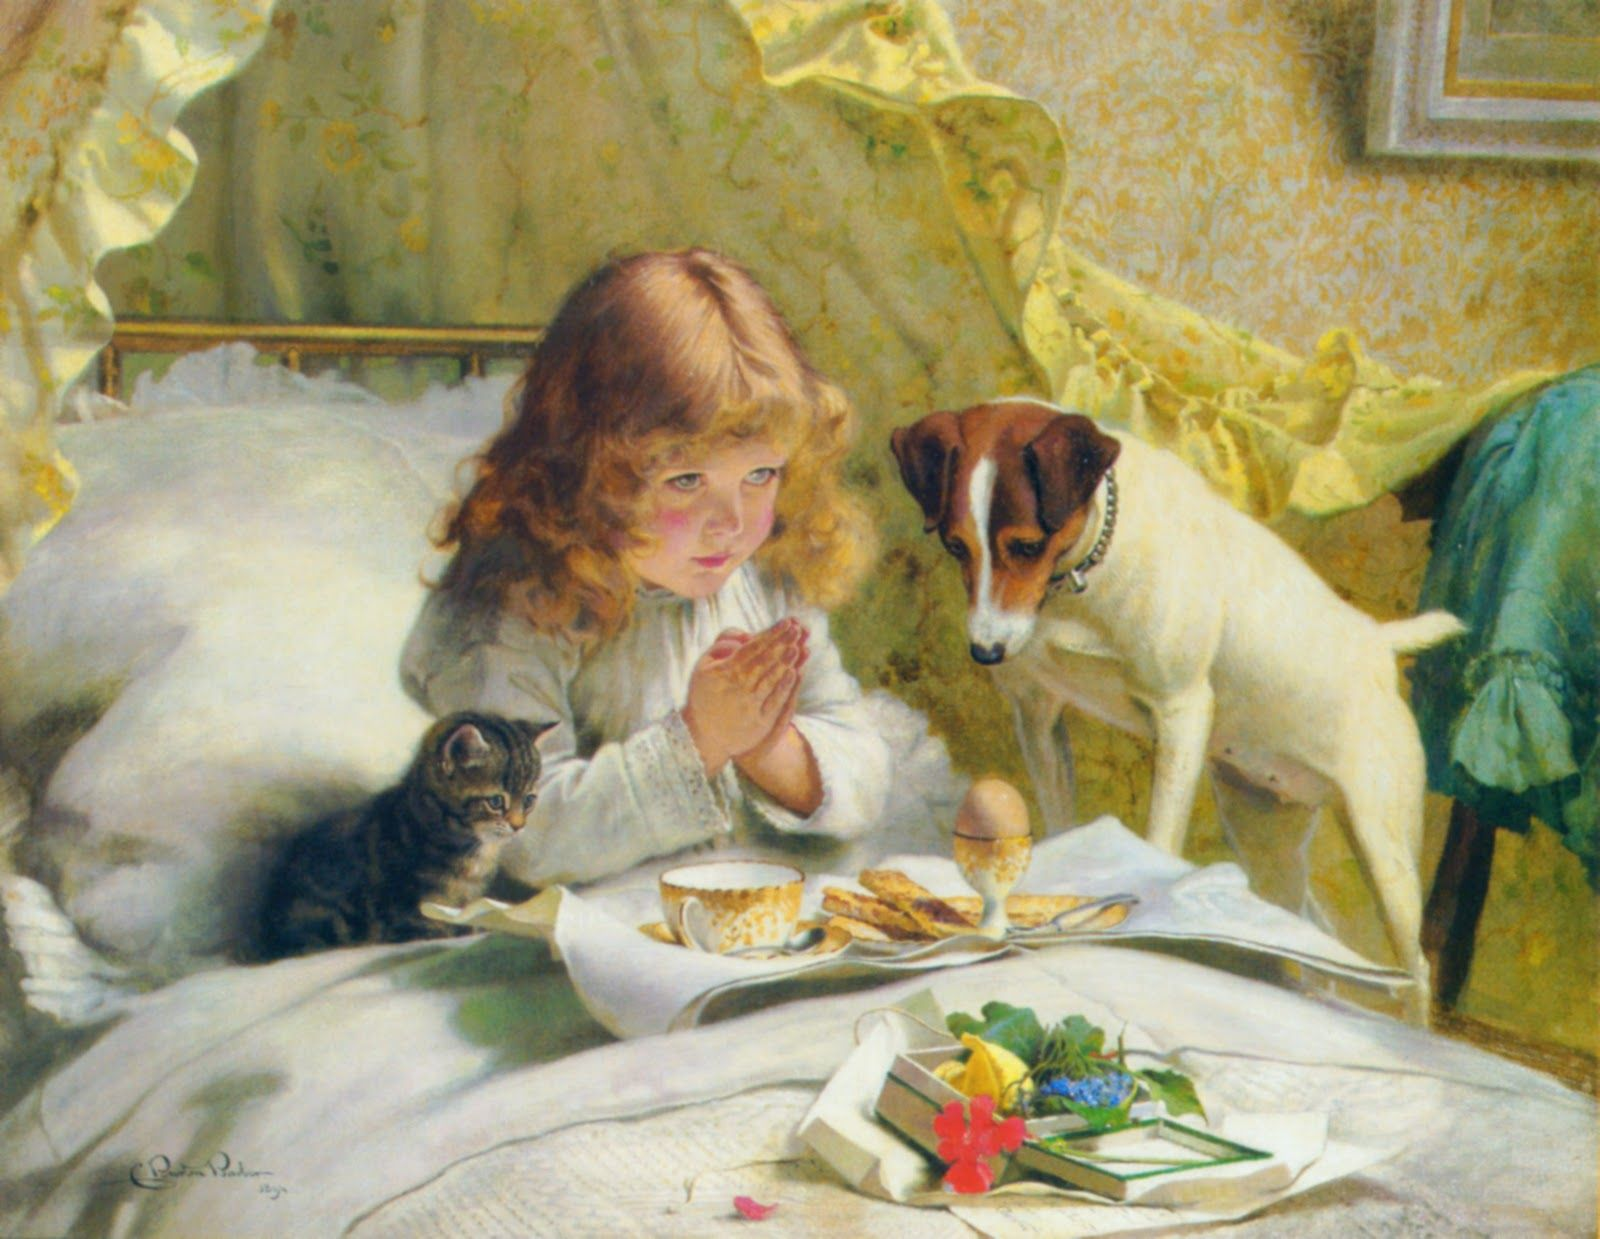 Suspense .1880 Charles Burton Barber Of Favorite Prints. Art And